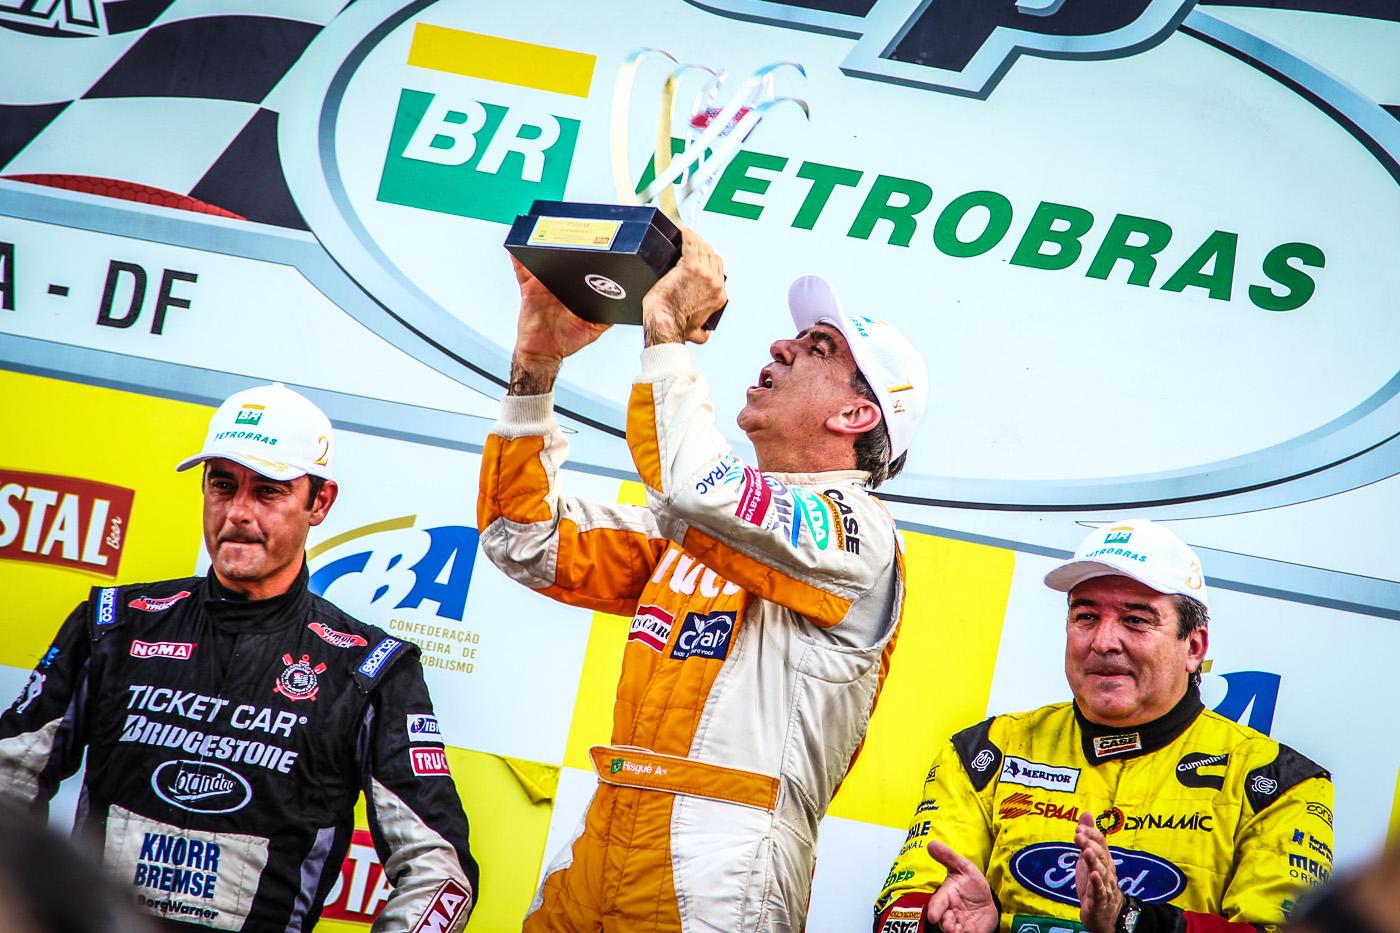 Beto Monteiro leva o título de campeão brasileiro da Fórmula Truck